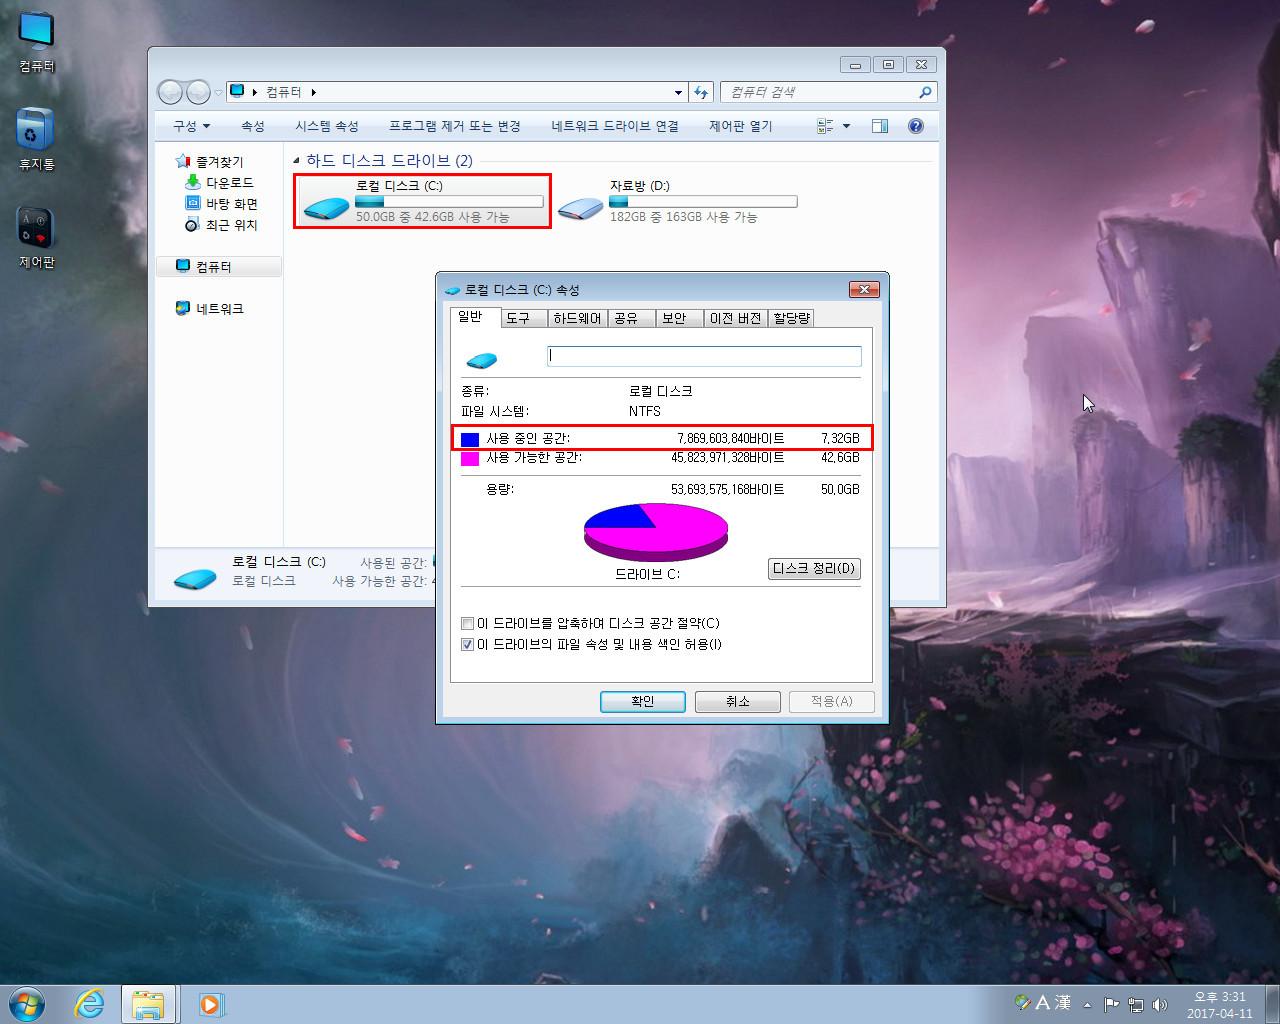 Windows 7 Ultimate_x64_Lite_KO_KY_OldMaC17.jpg